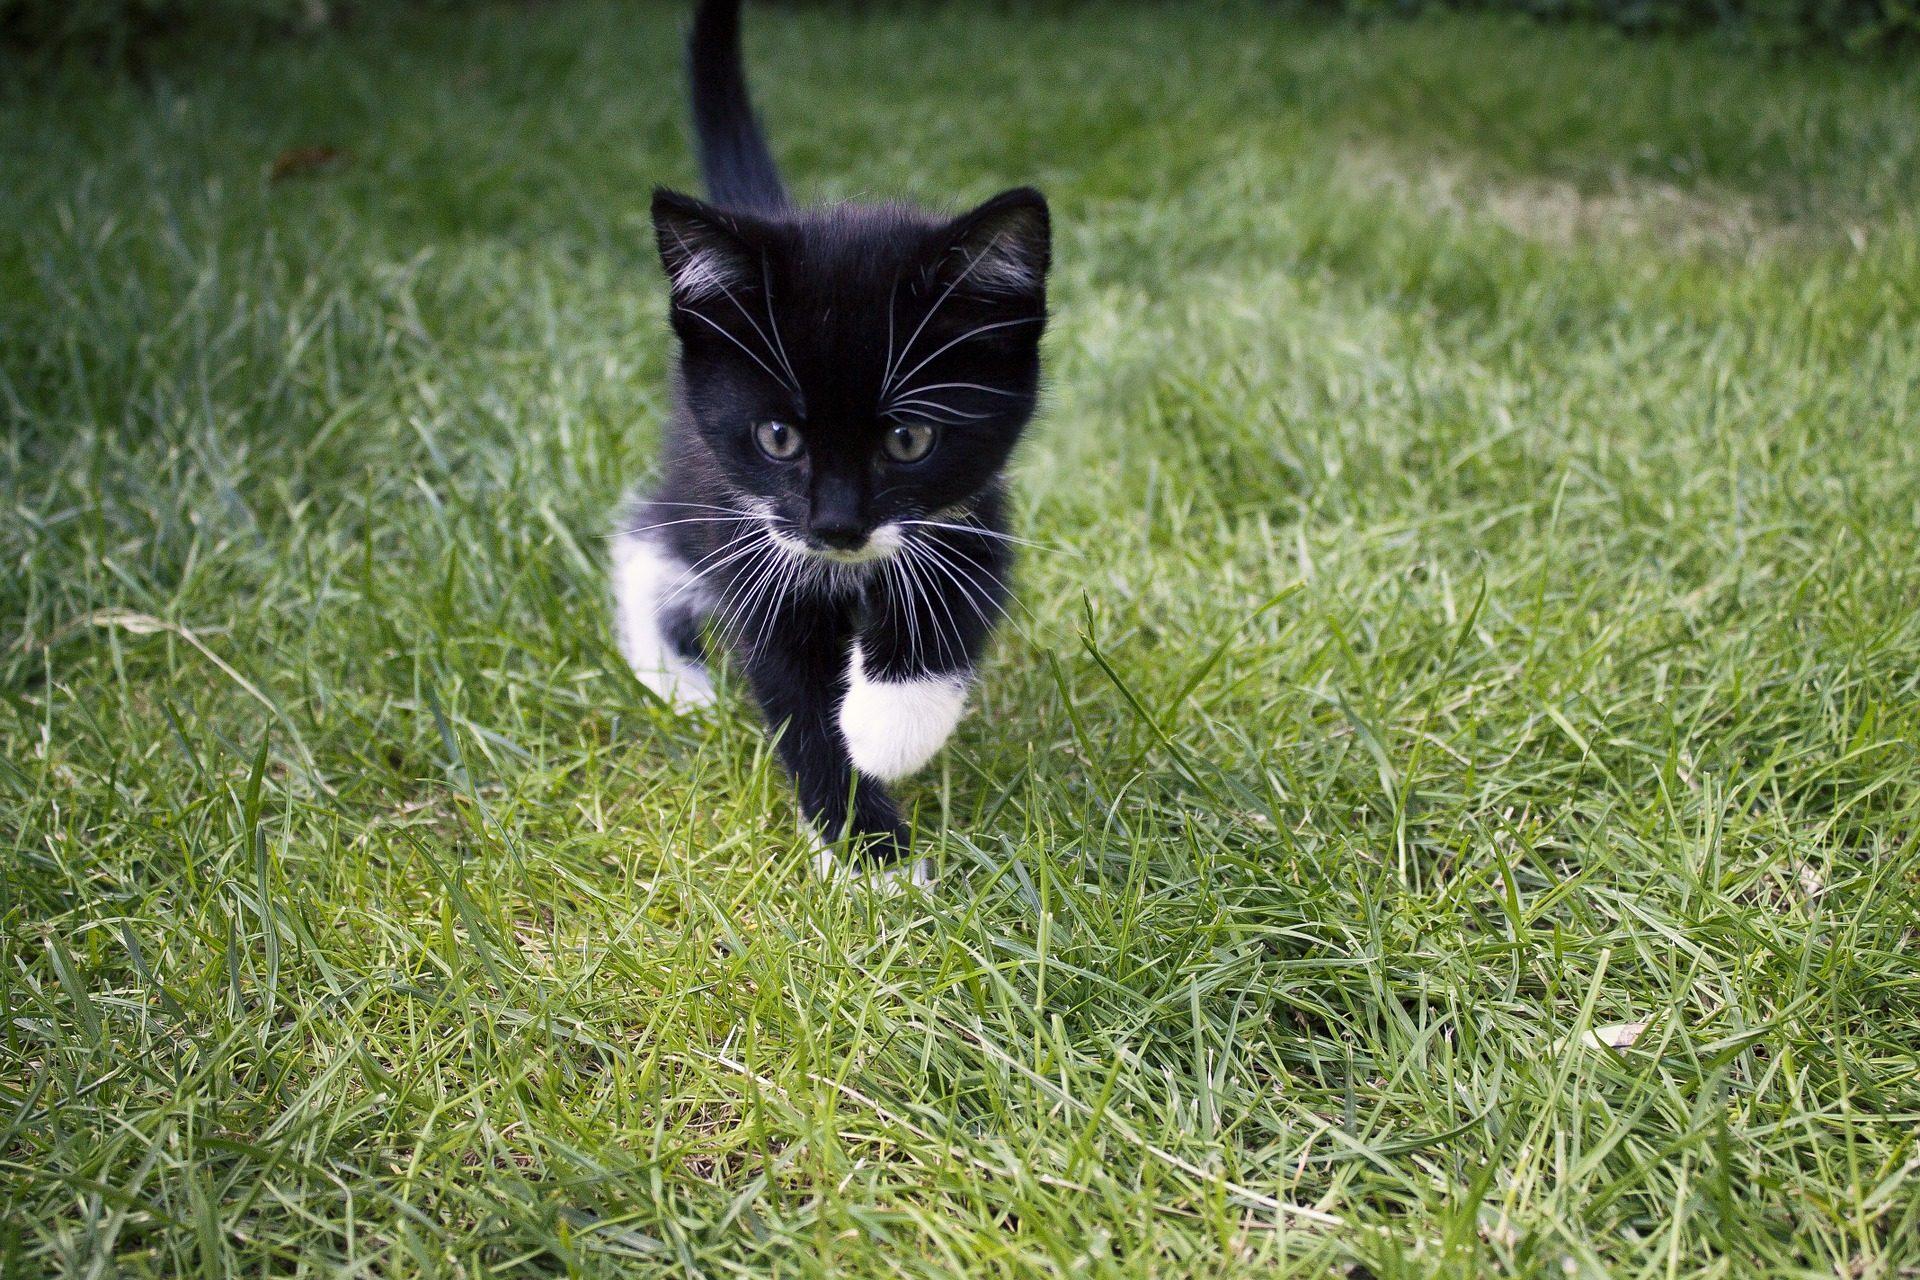 gato, cría, minino, gramado, Jardim, bigodes - Papéis de parede HD - Professor-falken.com